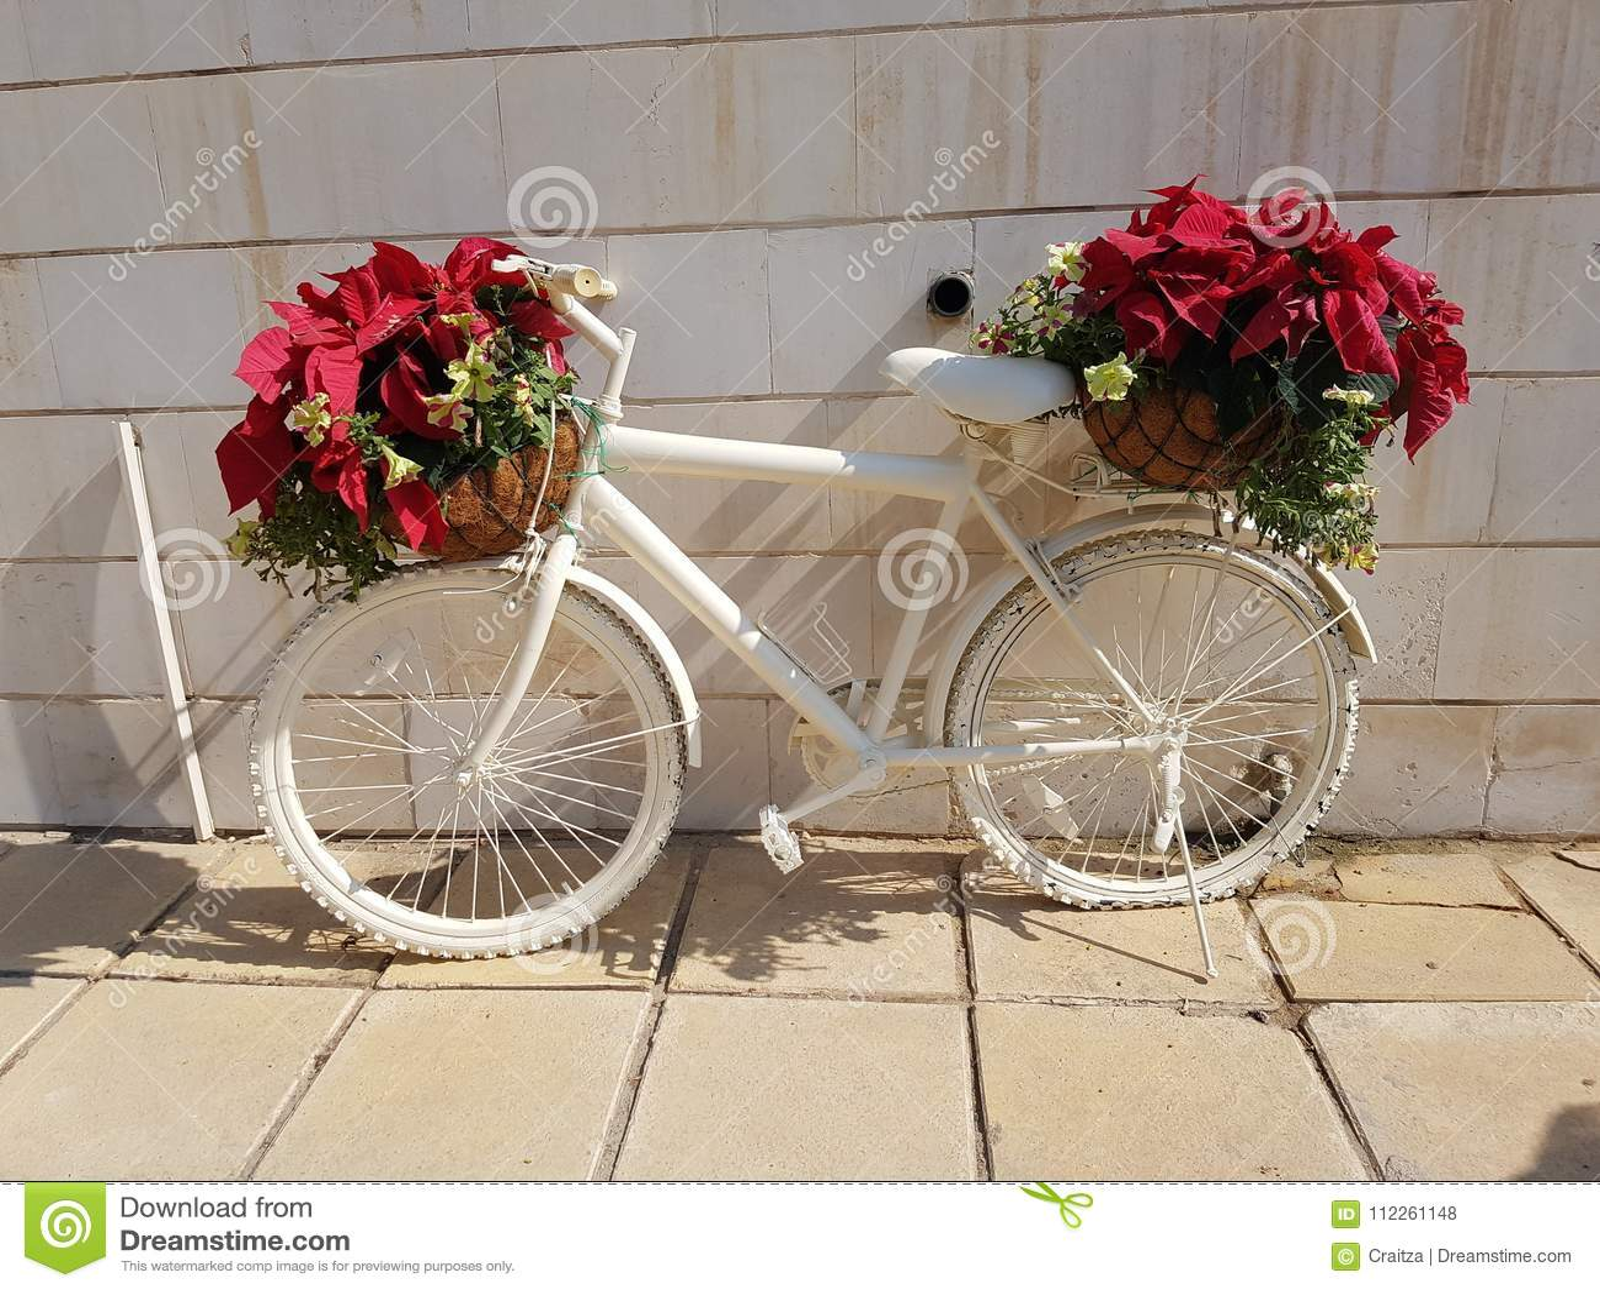 Creative flowers bouquets white bicycle display stock photo image creative flowers bouquets white bicycle display izmirmasajfo